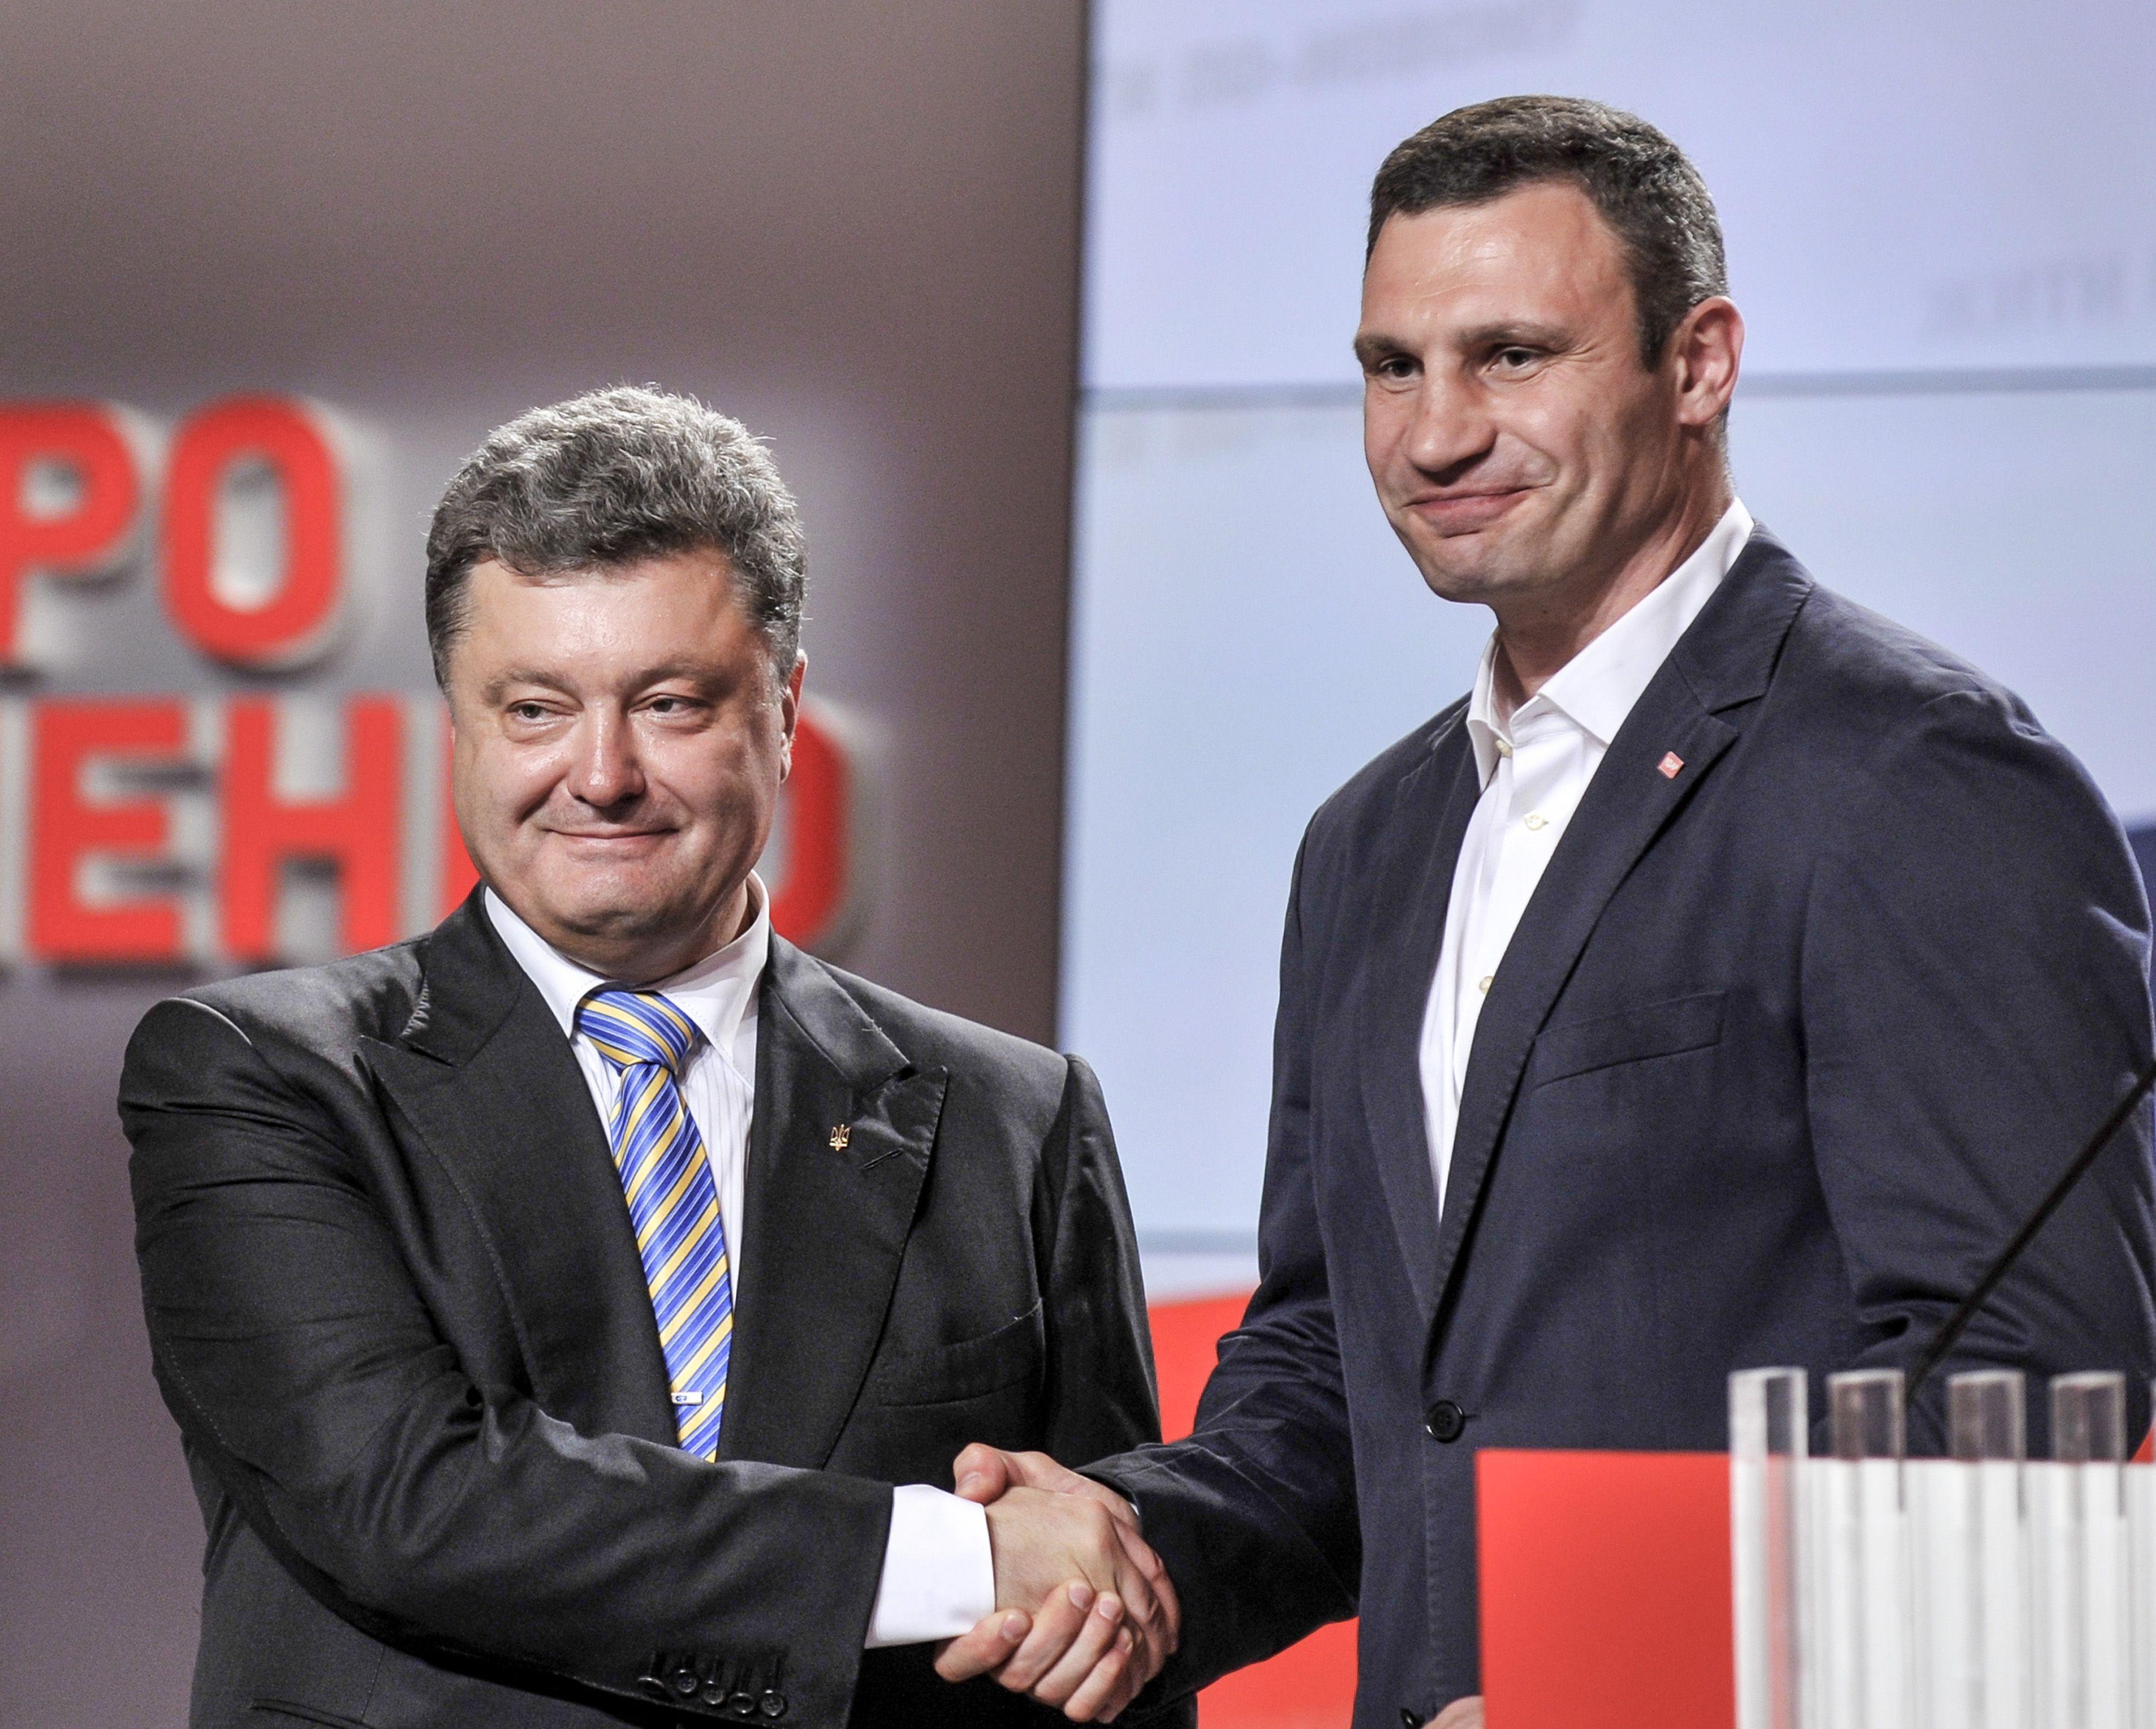 Poroshenko se saluda con Klitschko